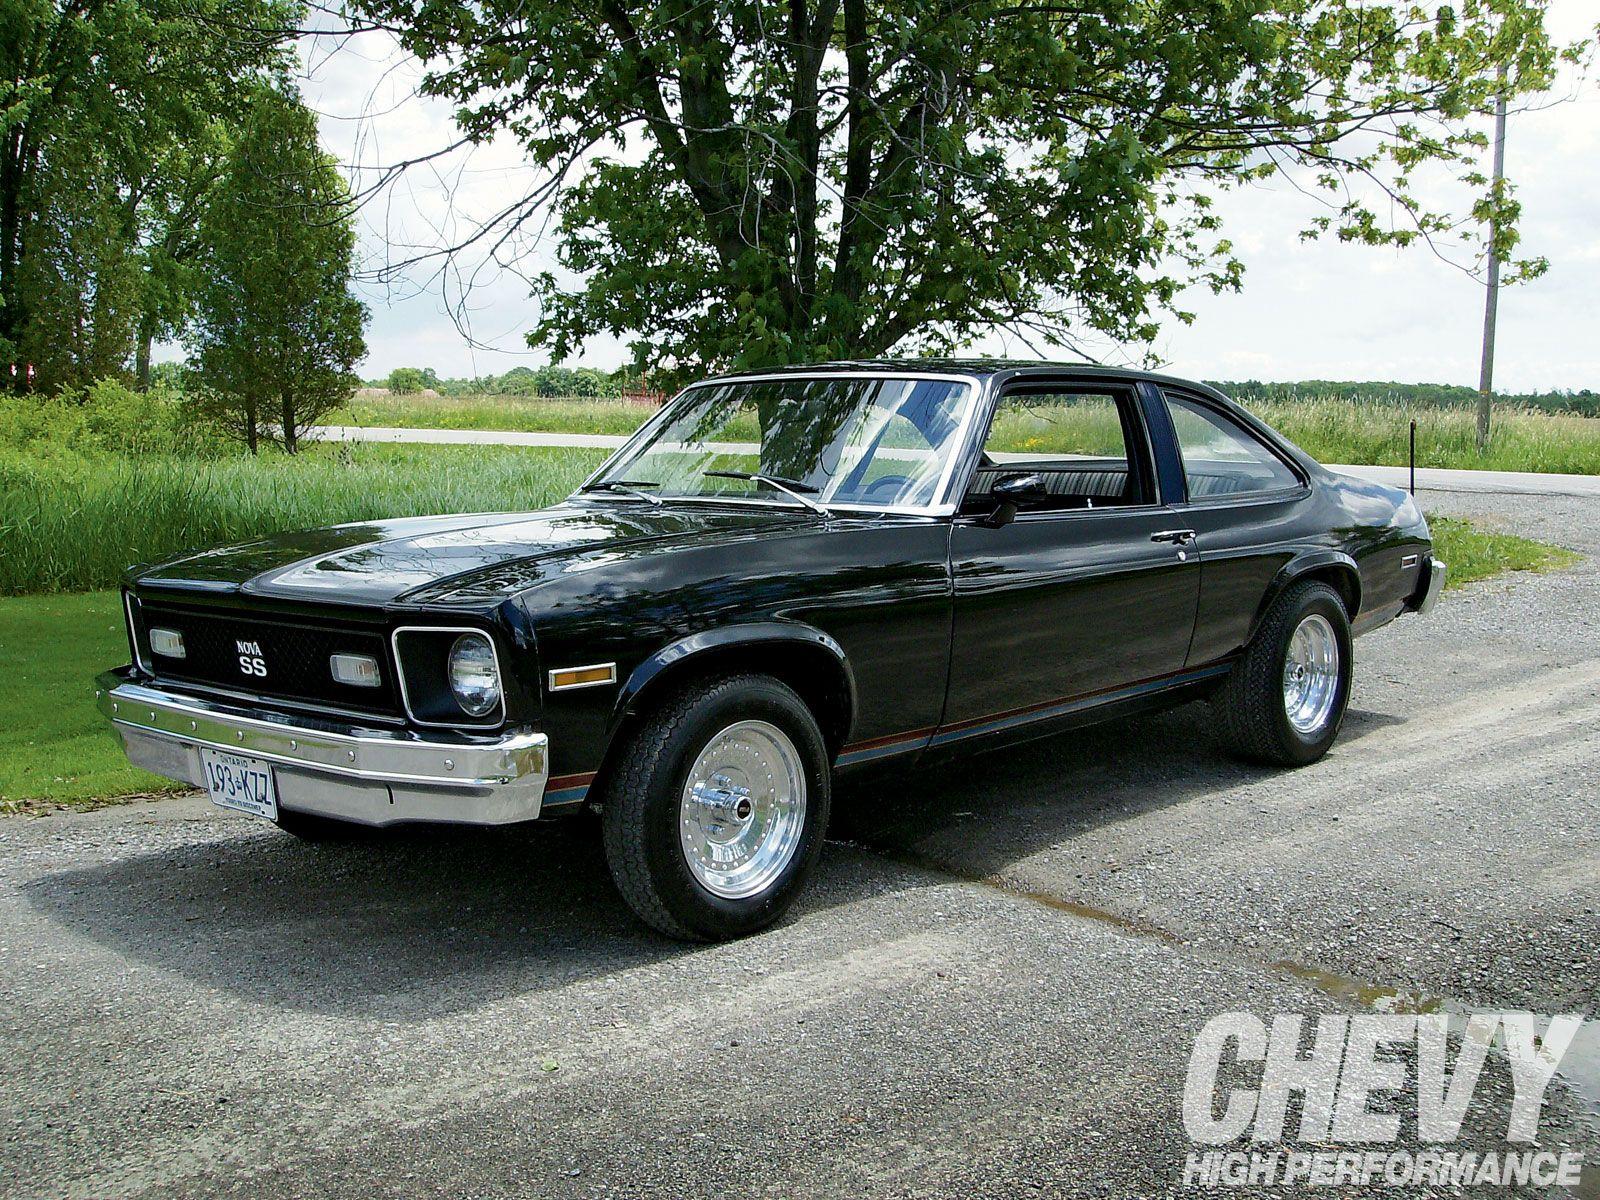 1975 Chevy Nova Chevrolet Nova Pinterest